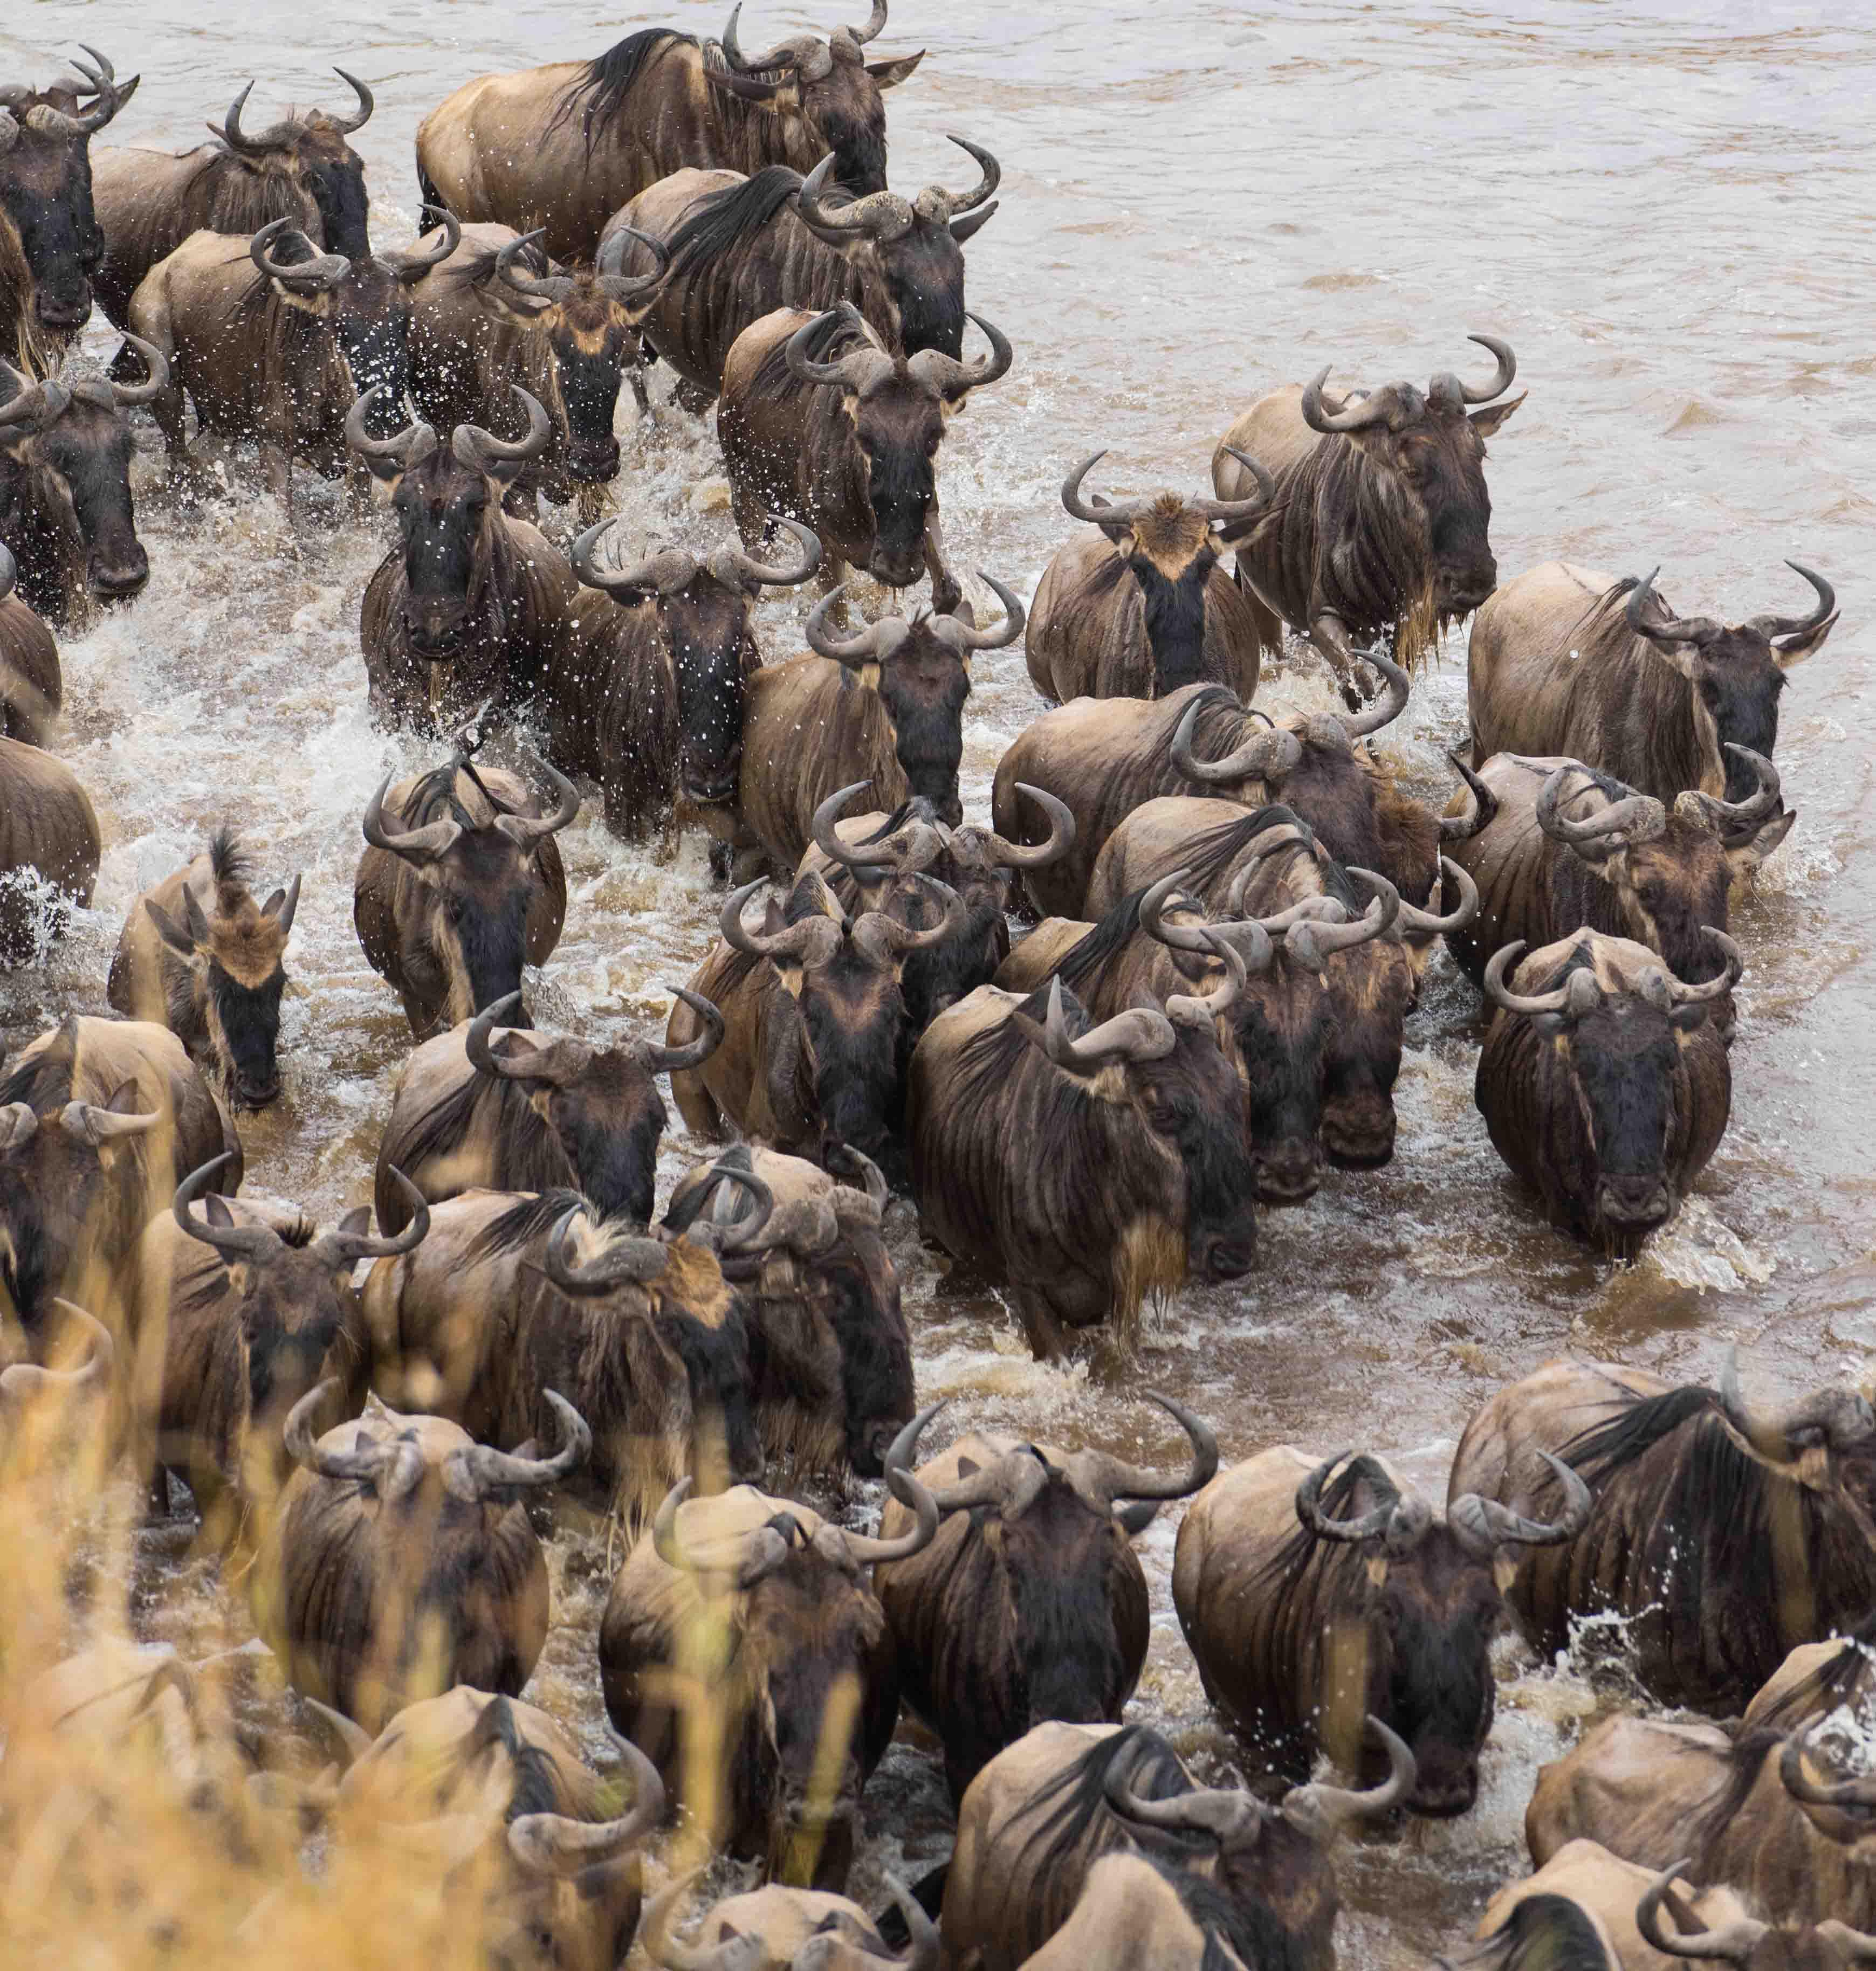 grote trek Tanzania